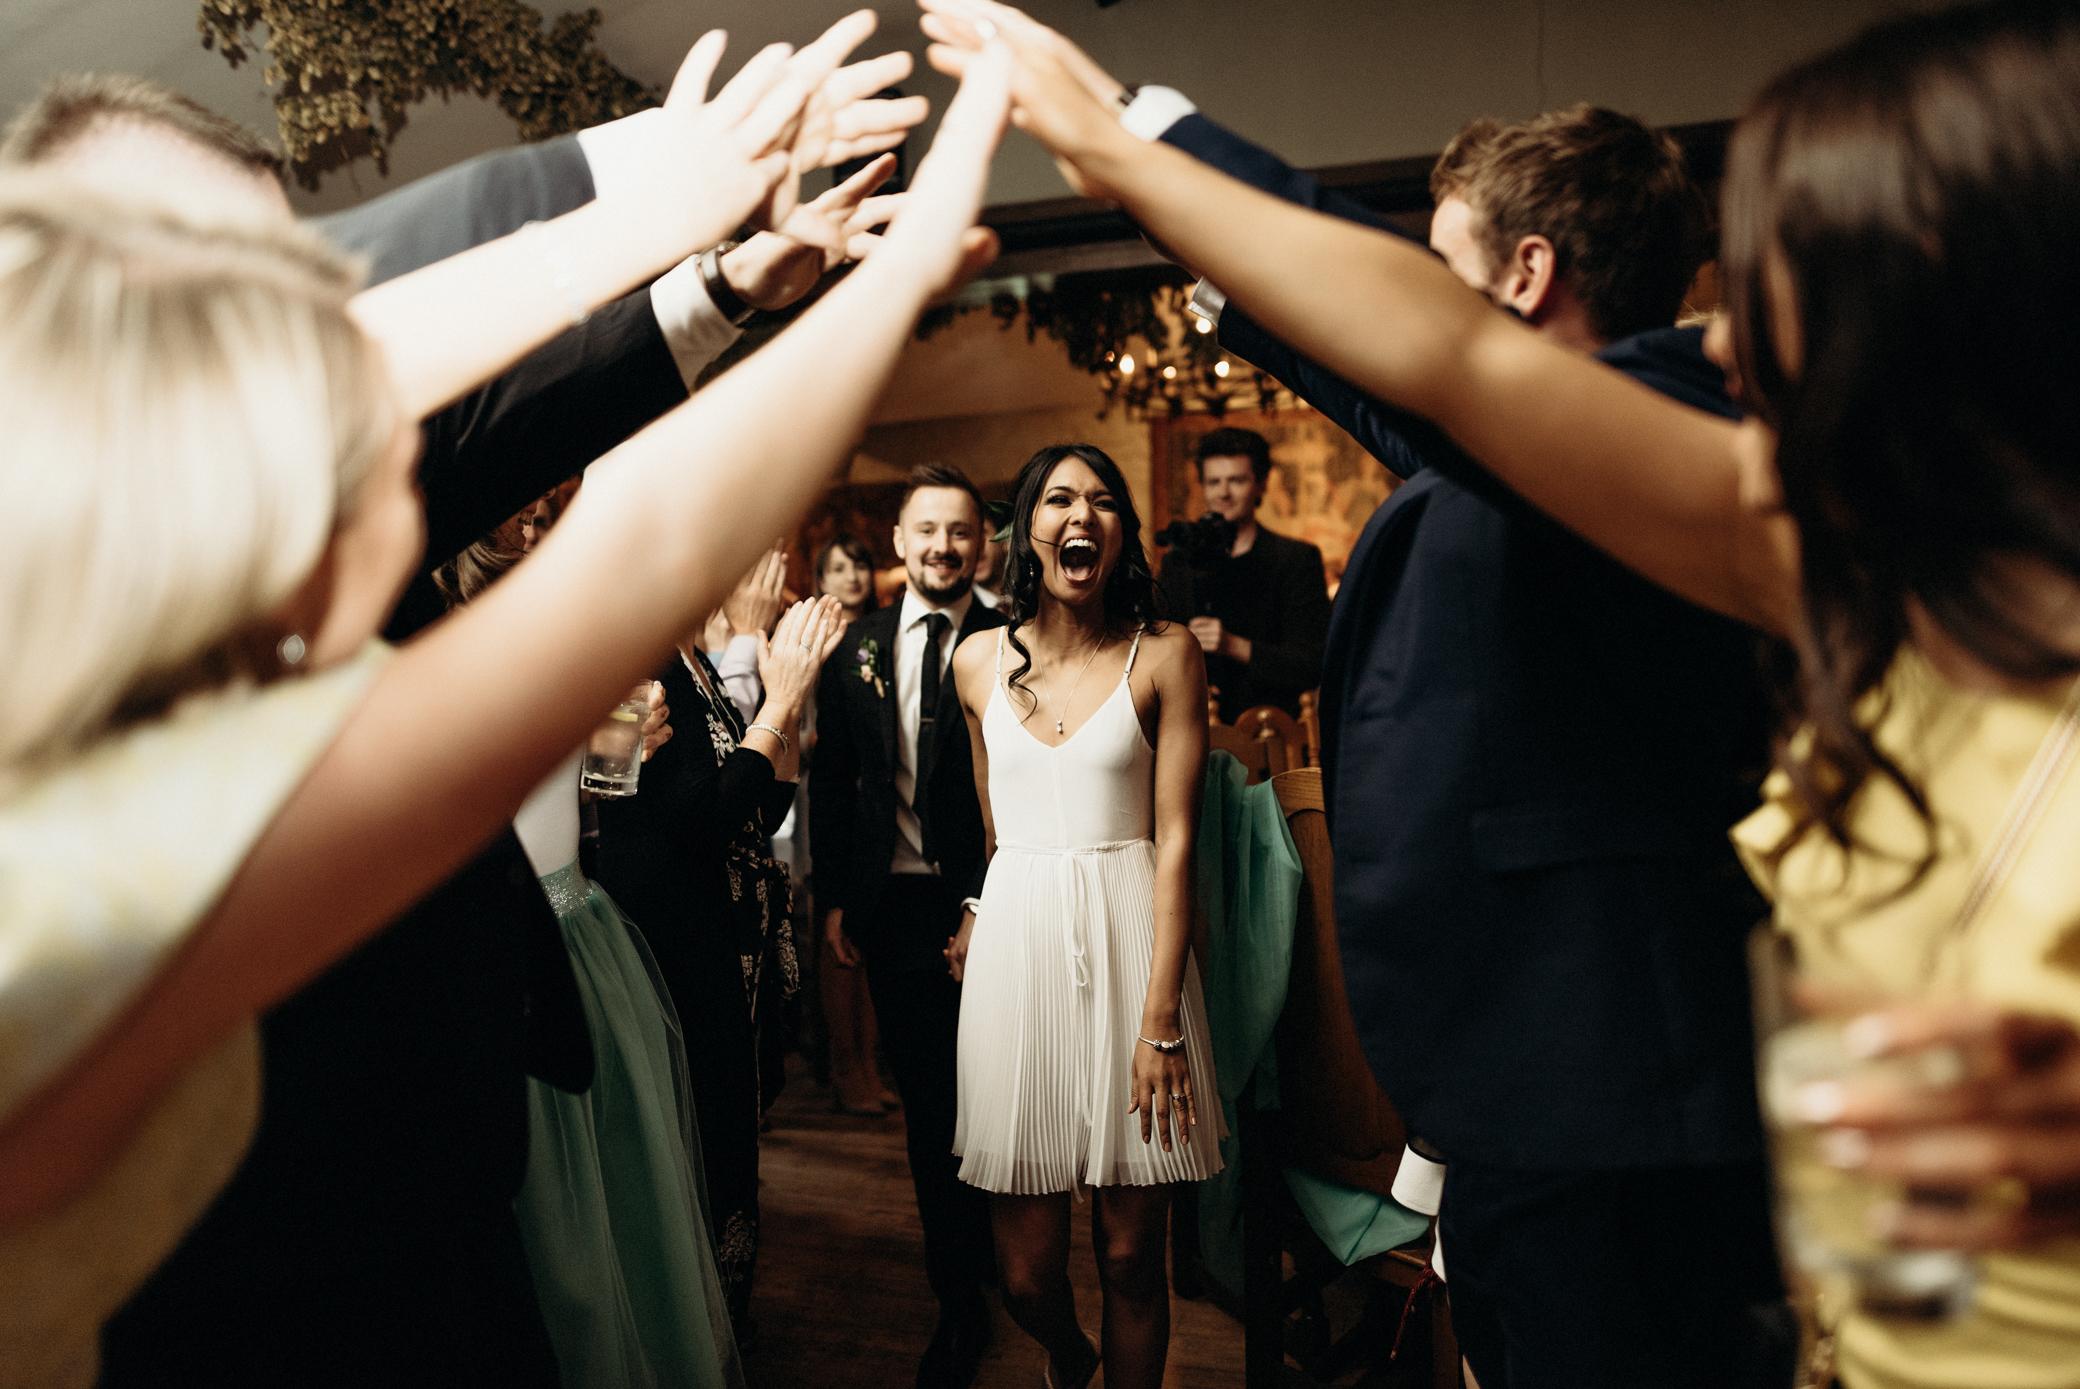 Alan&Naz- Barberstown Castle Wedding - Wedding photographer Ireland-202.jpg